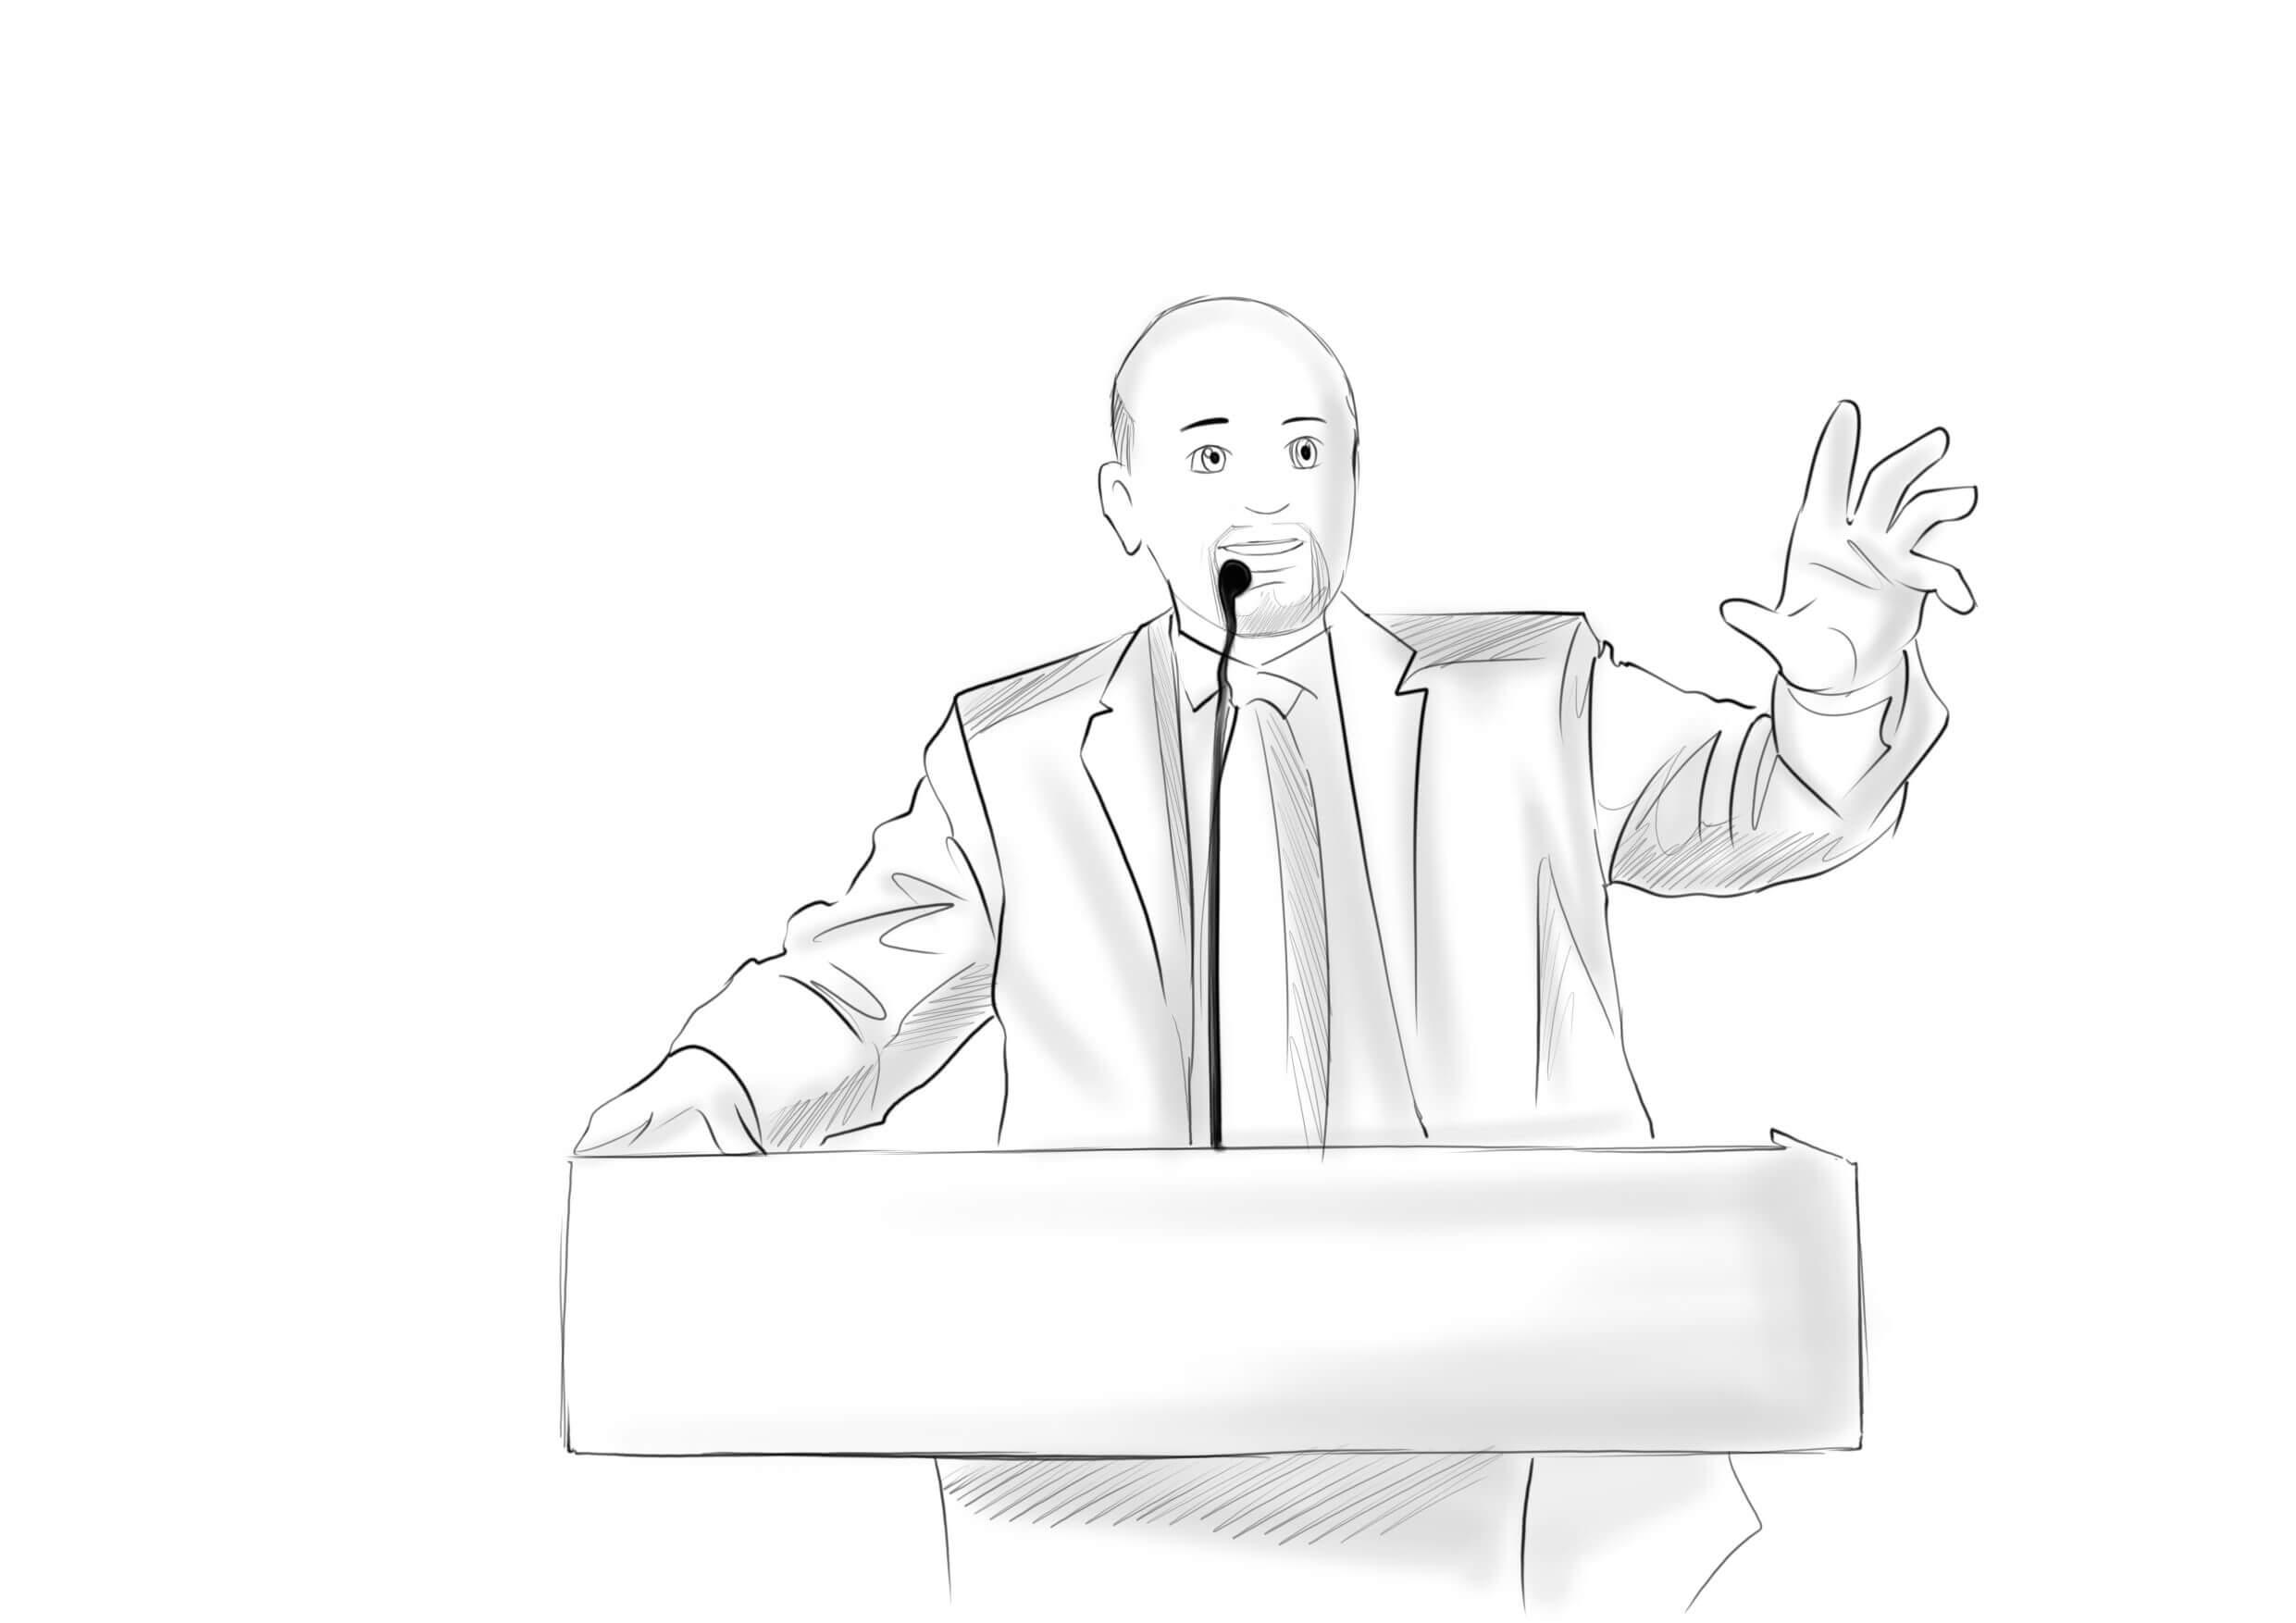 POLITICIAN SPEAKING AT A PODIUM